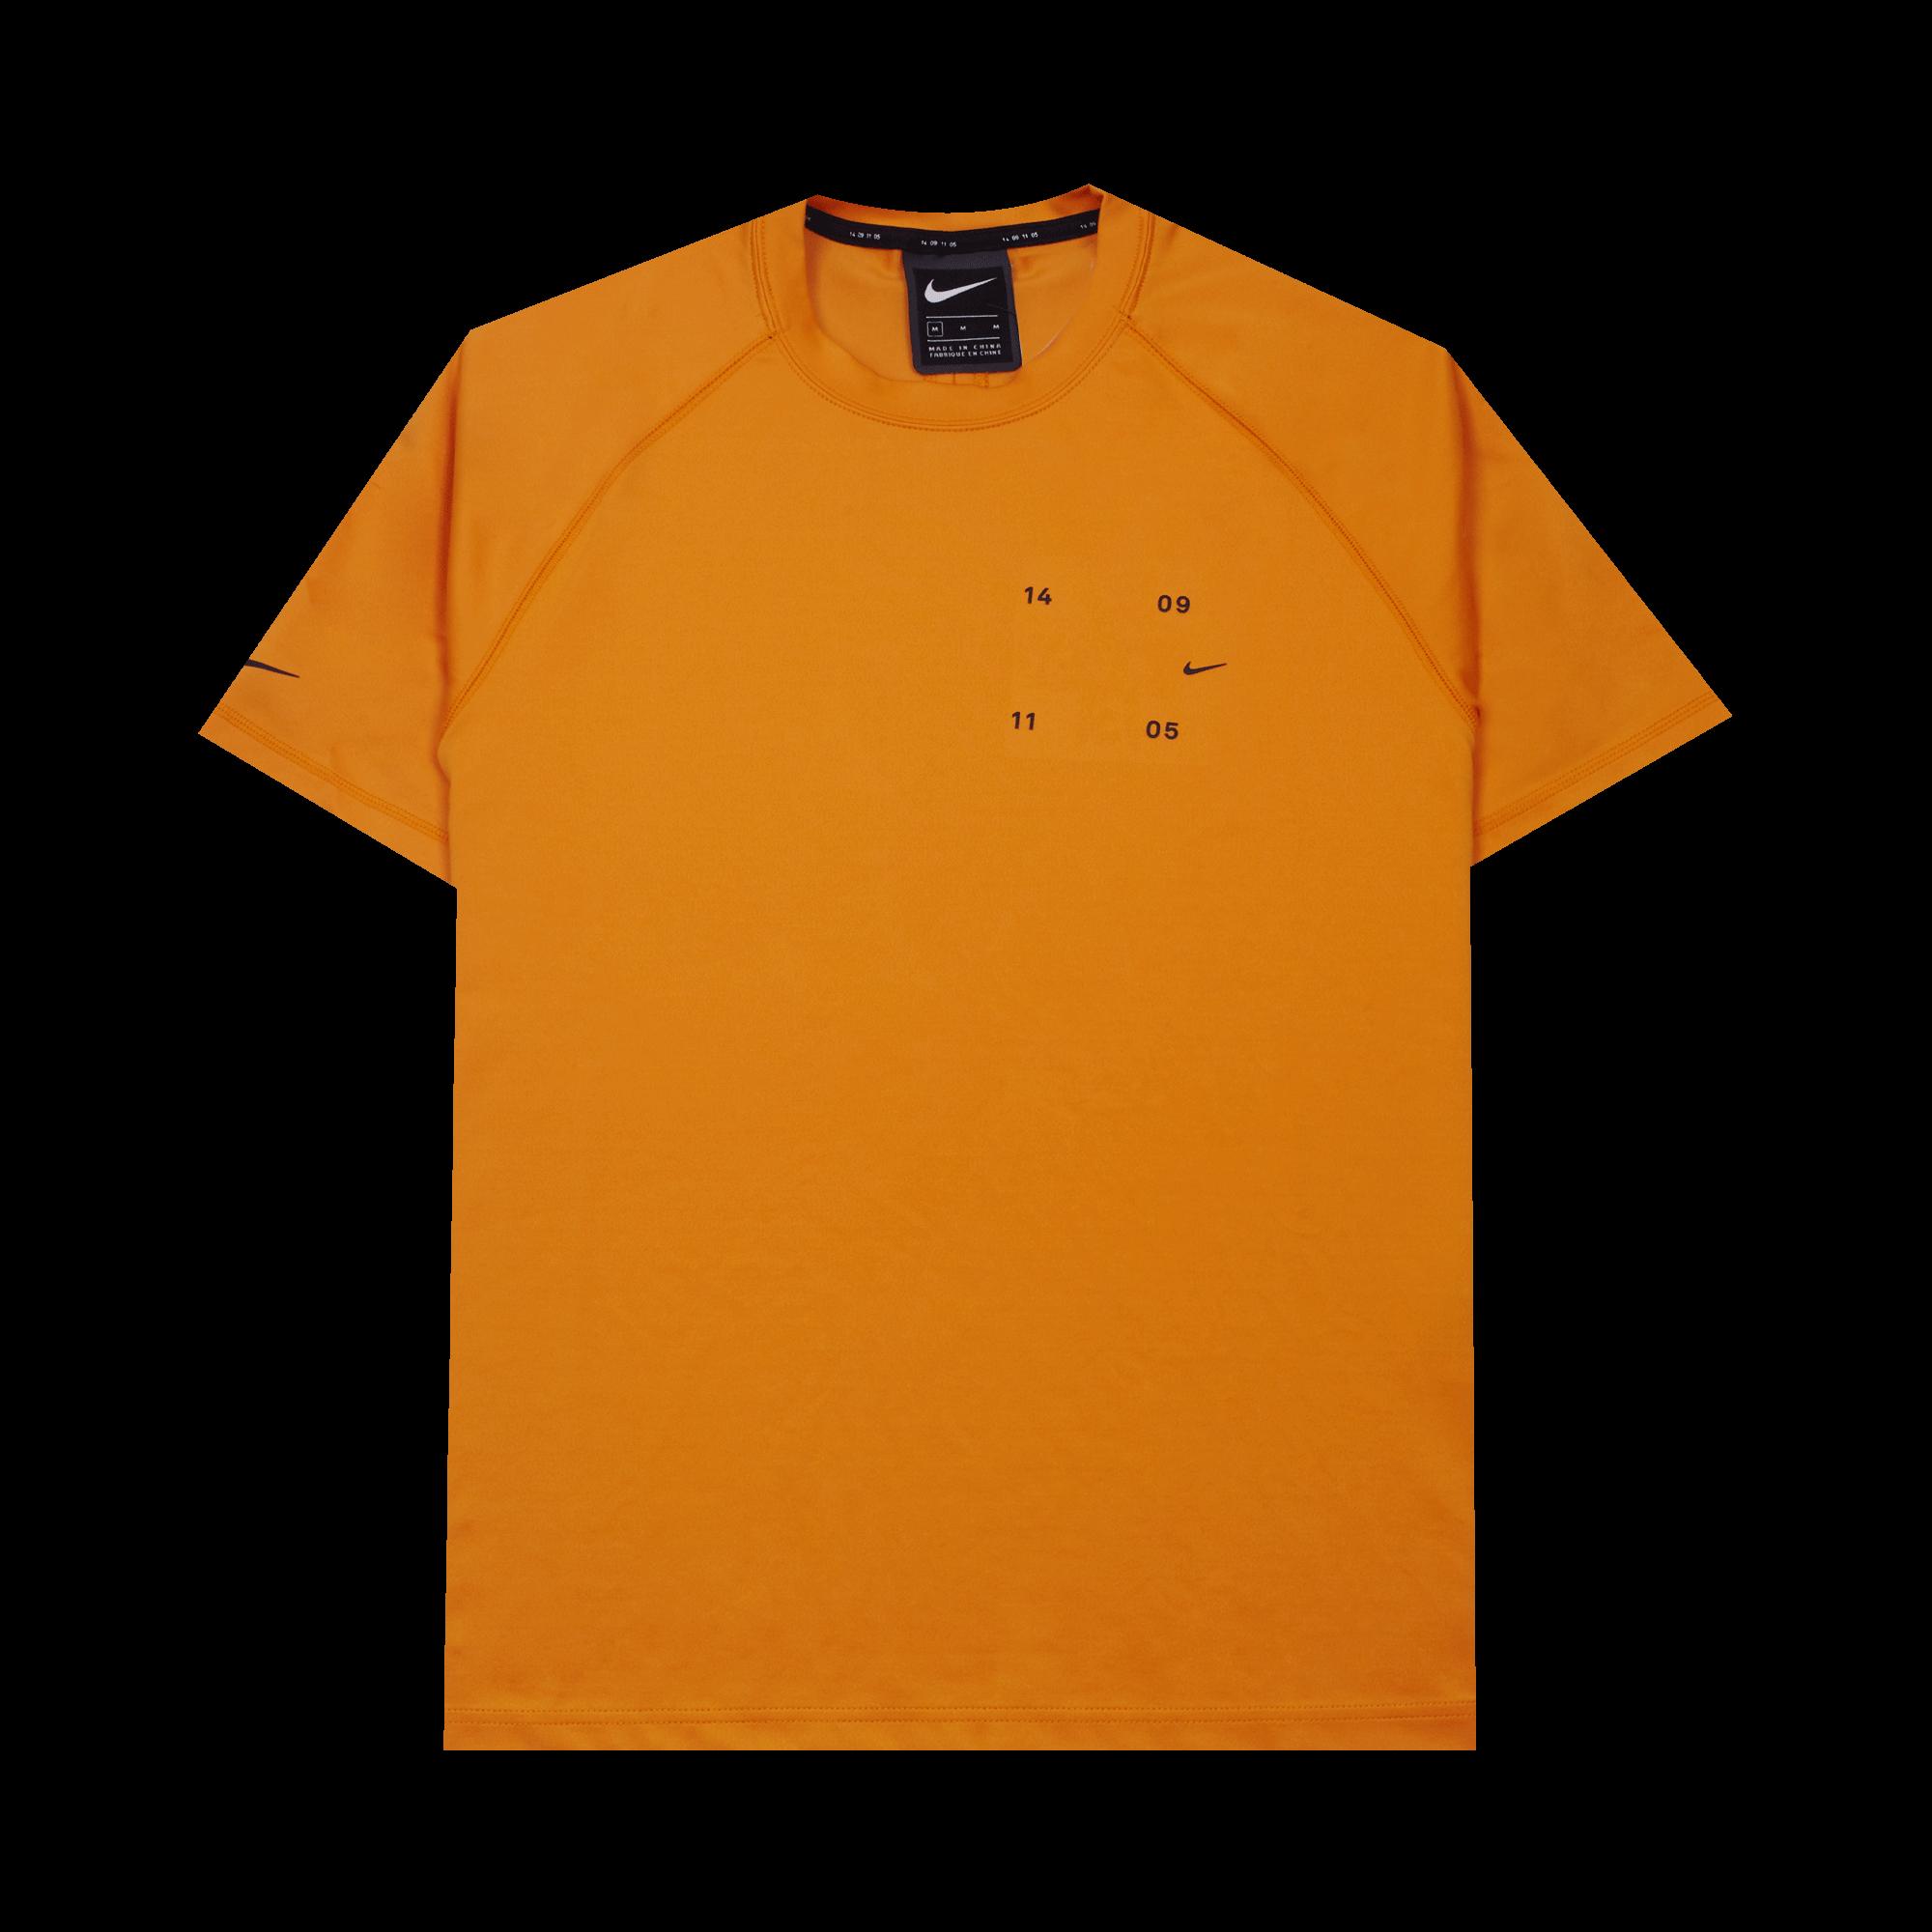 nouveaux styles b0082 4b00b Nike NSW Tech Pack T-Shirt kumquat / black - T-shirt | Holypopstore.com